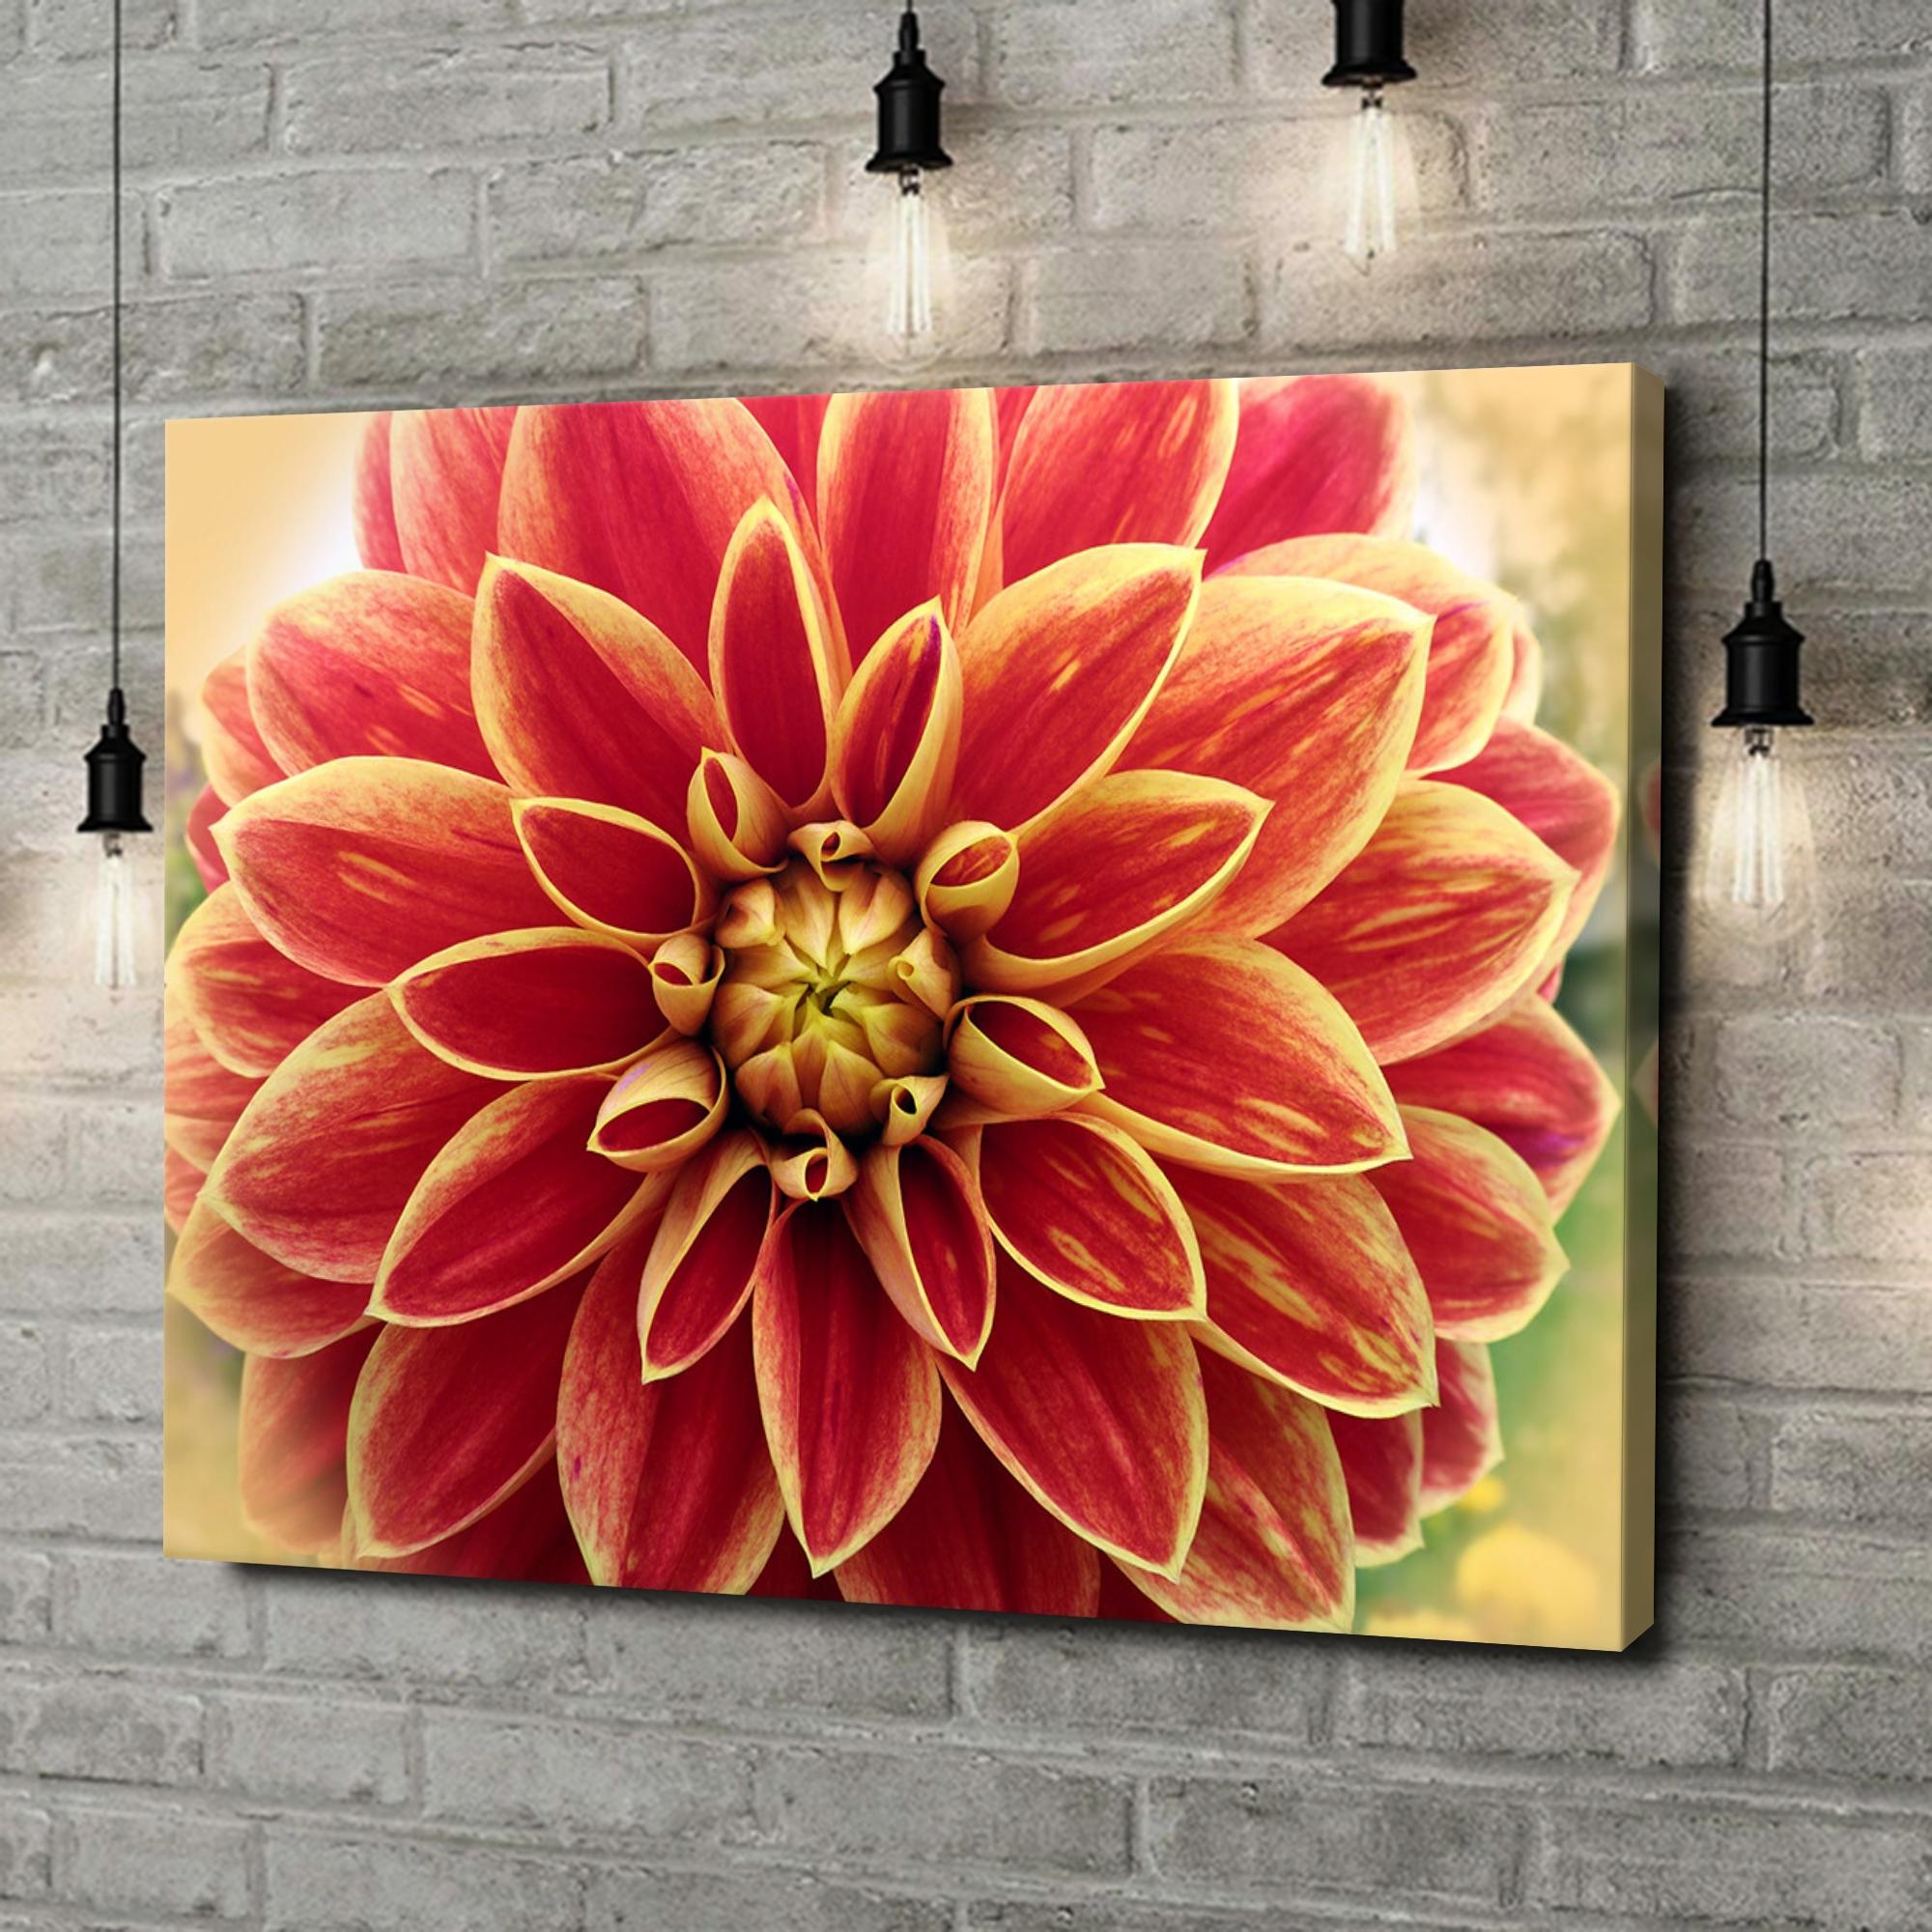 Leinwandbild personalisiert Rote Chrysantheme